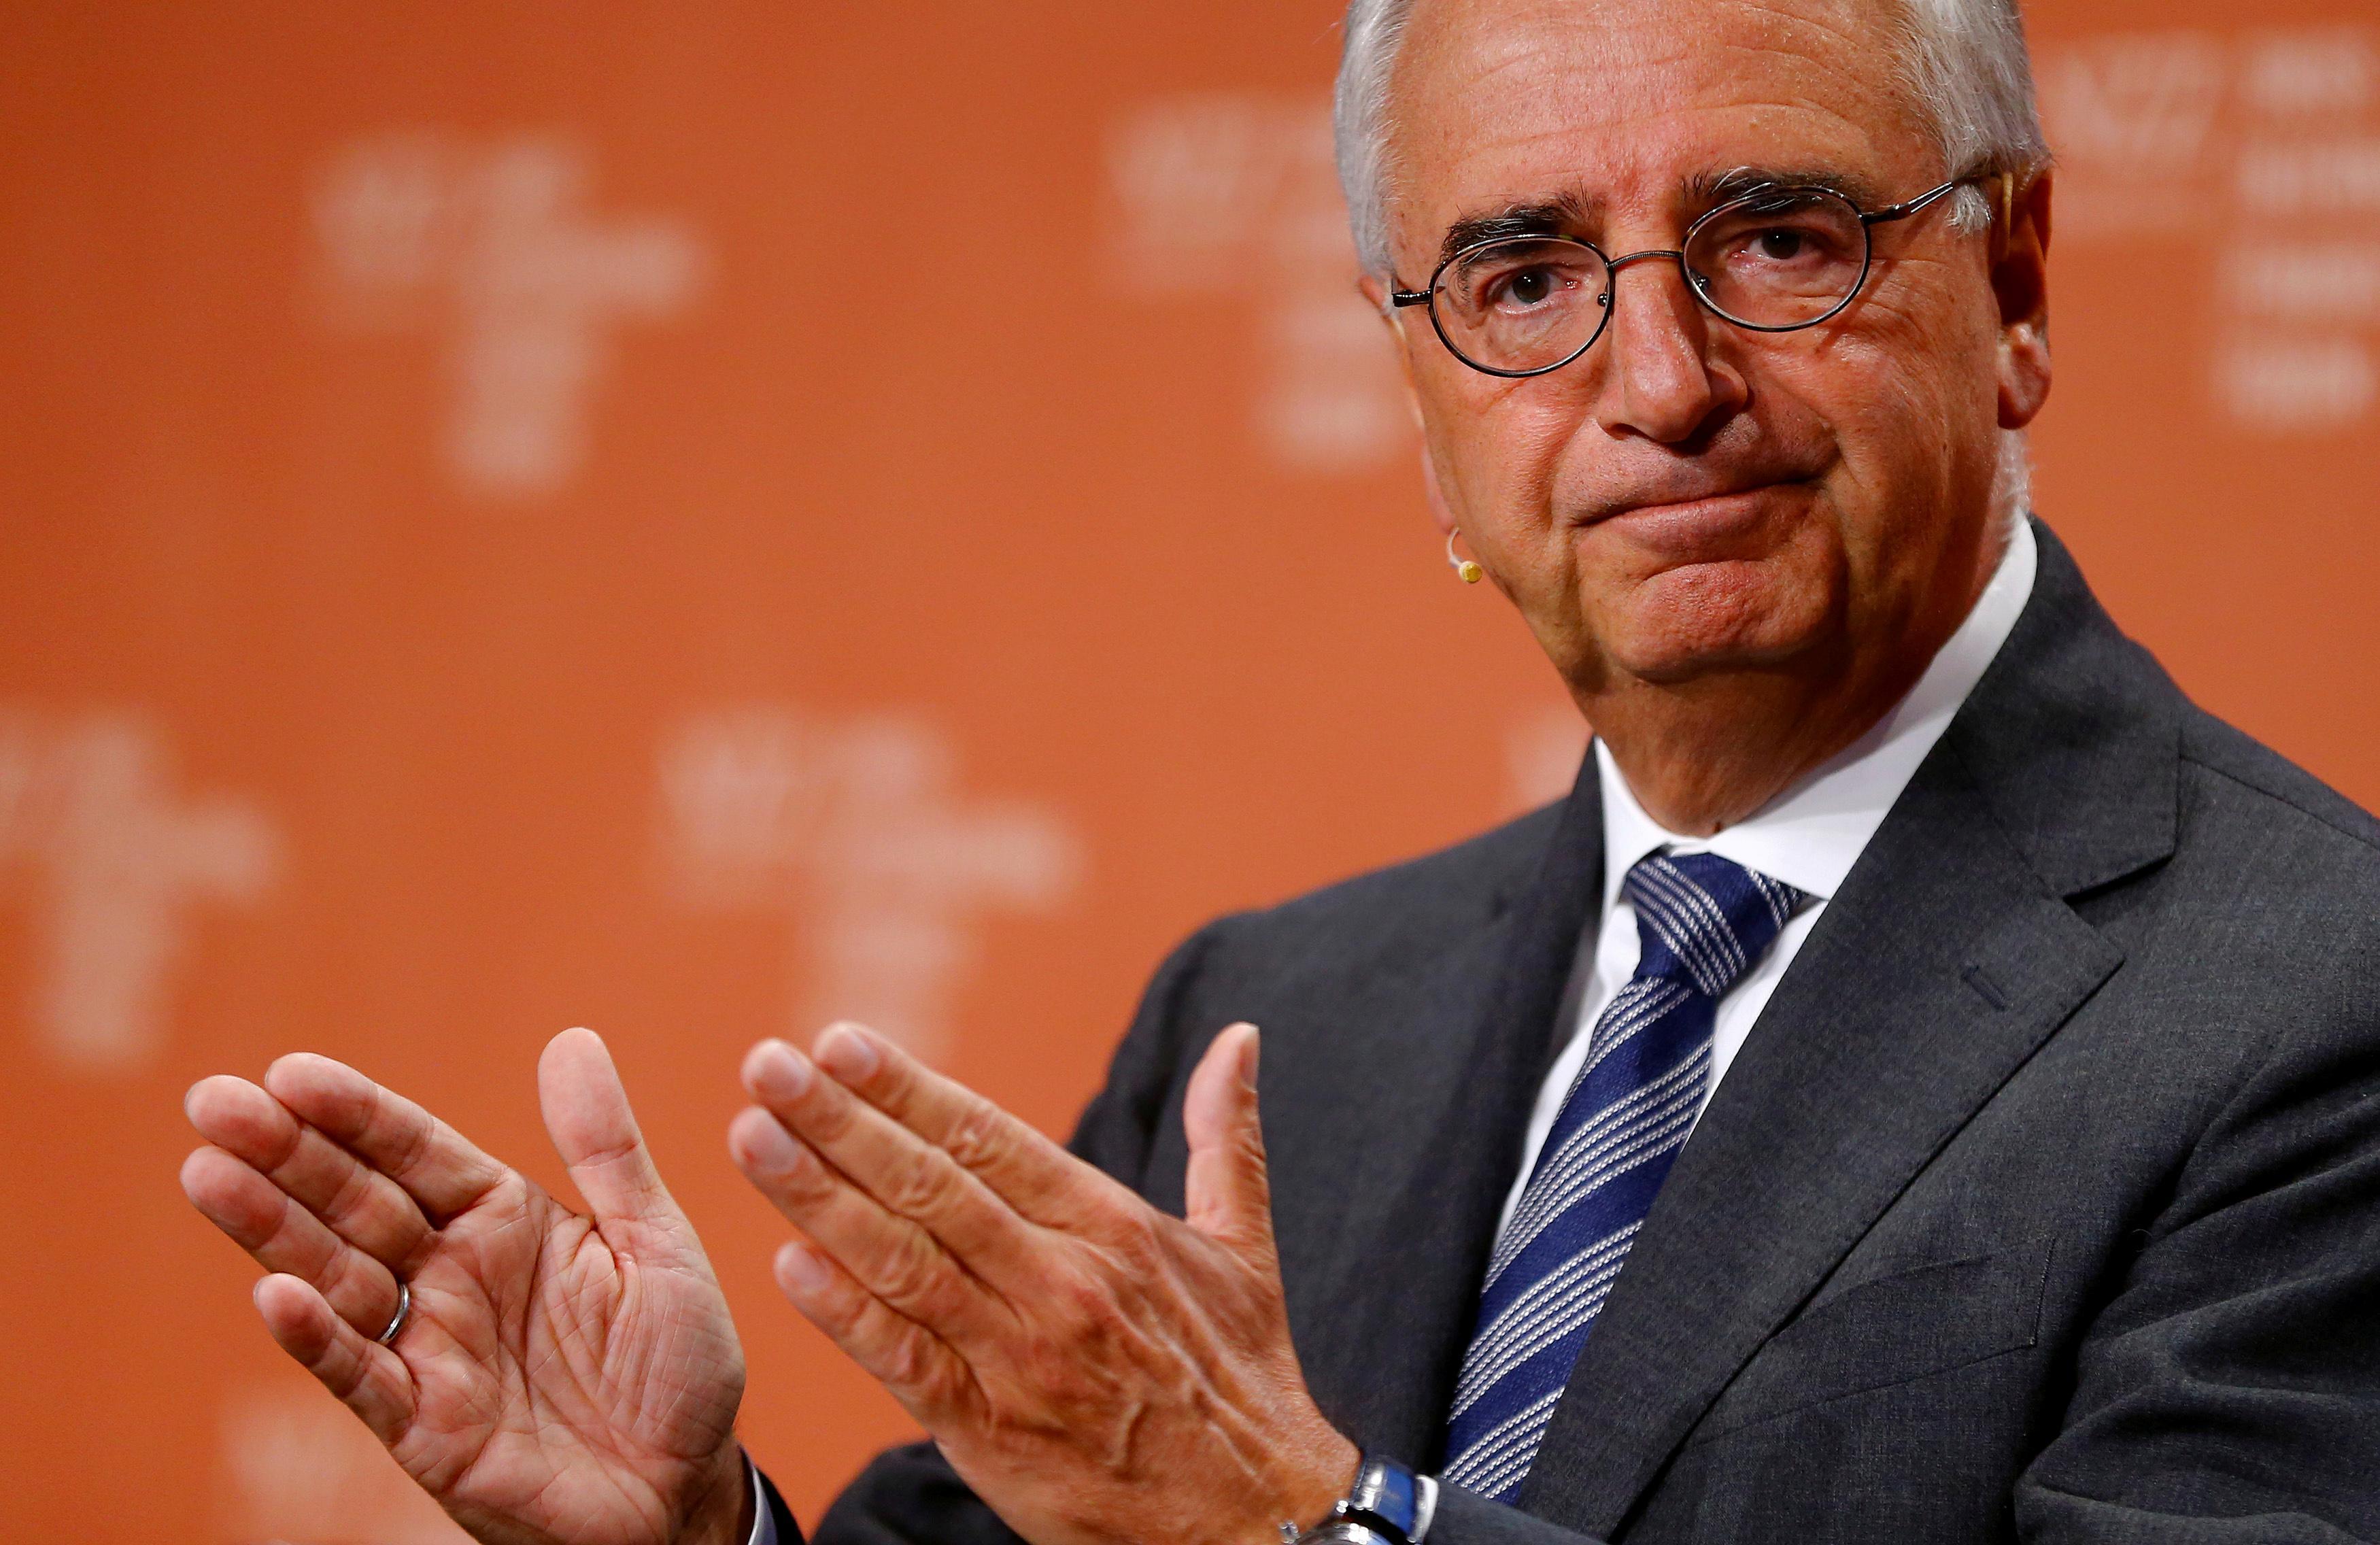 Some top Deutsche Bank investors want chairman to step down early: Der Spiegel